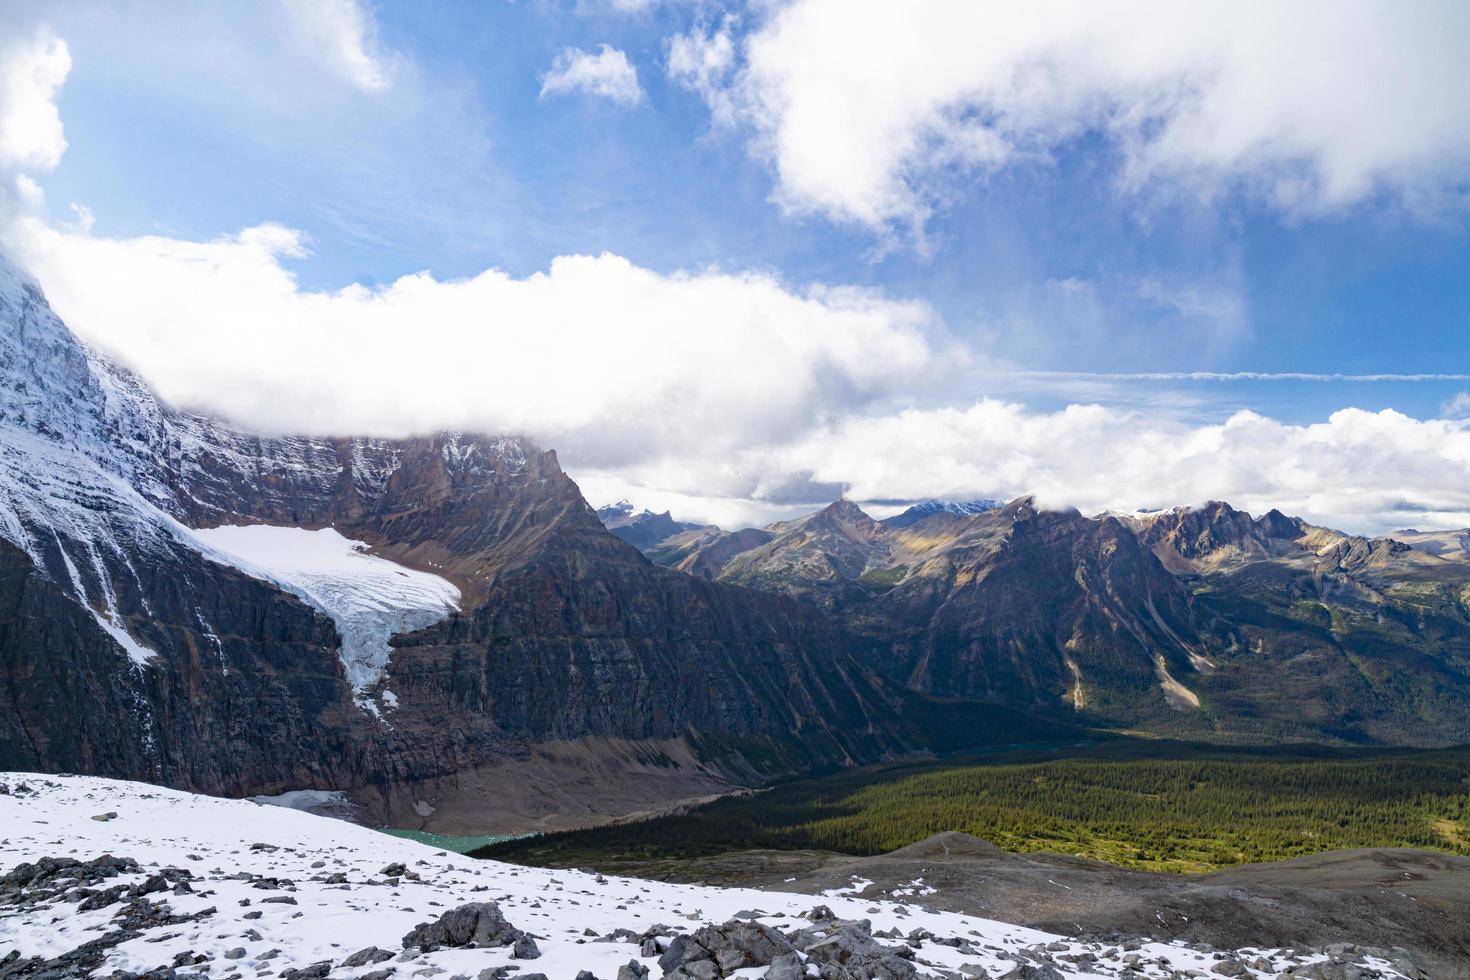 Rocky mountain wilderness photo